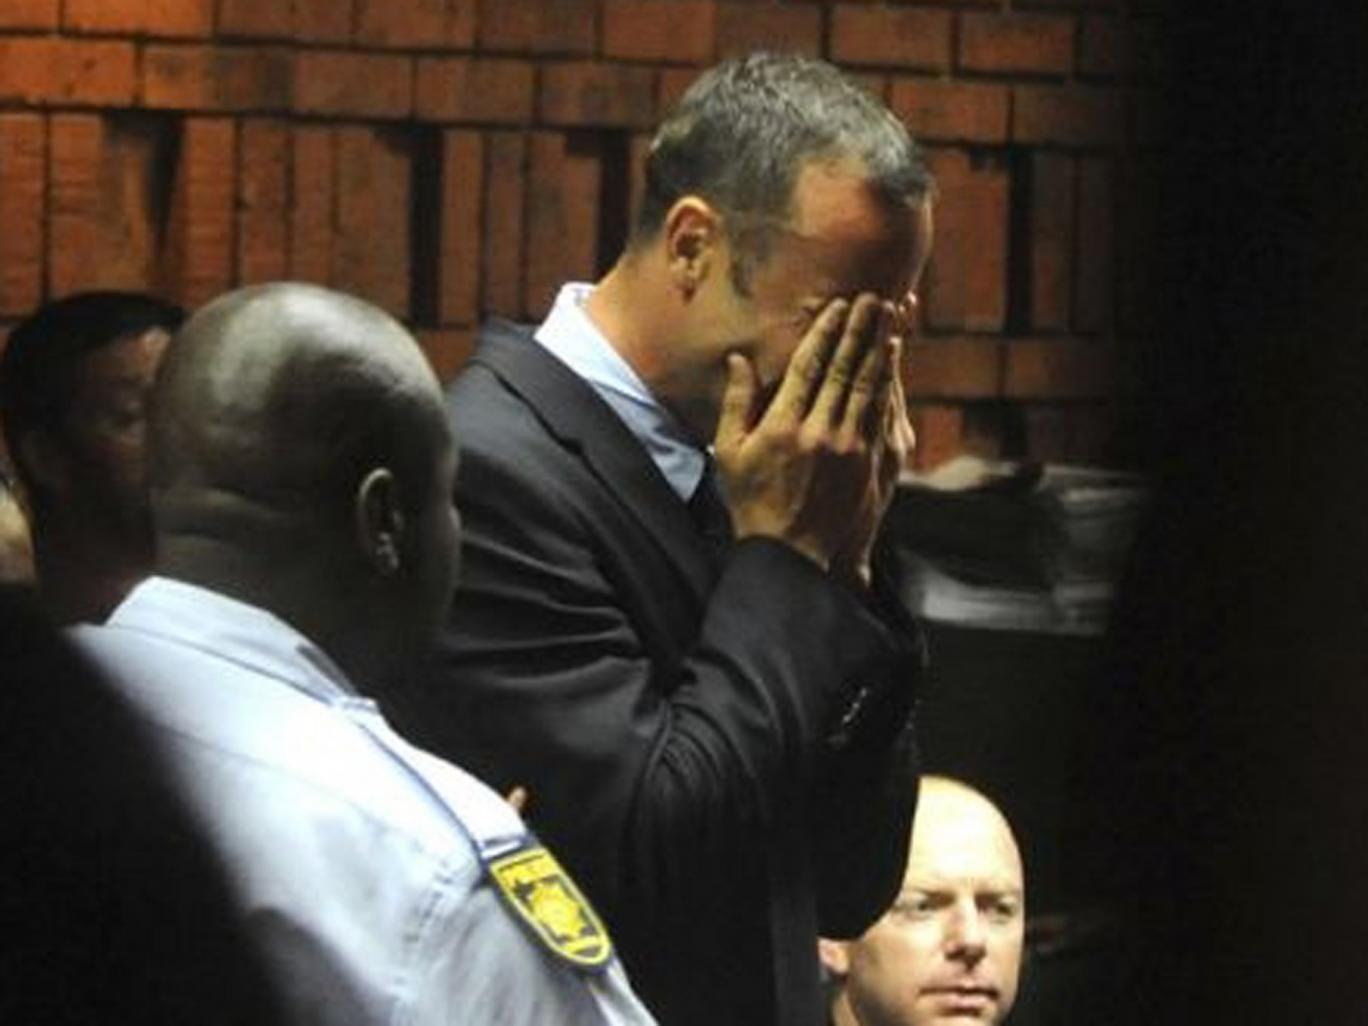 Athlete Oscar Pistorius weeps in court in Pretoria at his bail hearing in the murder case of his girlfriend Reeva Steenkamp